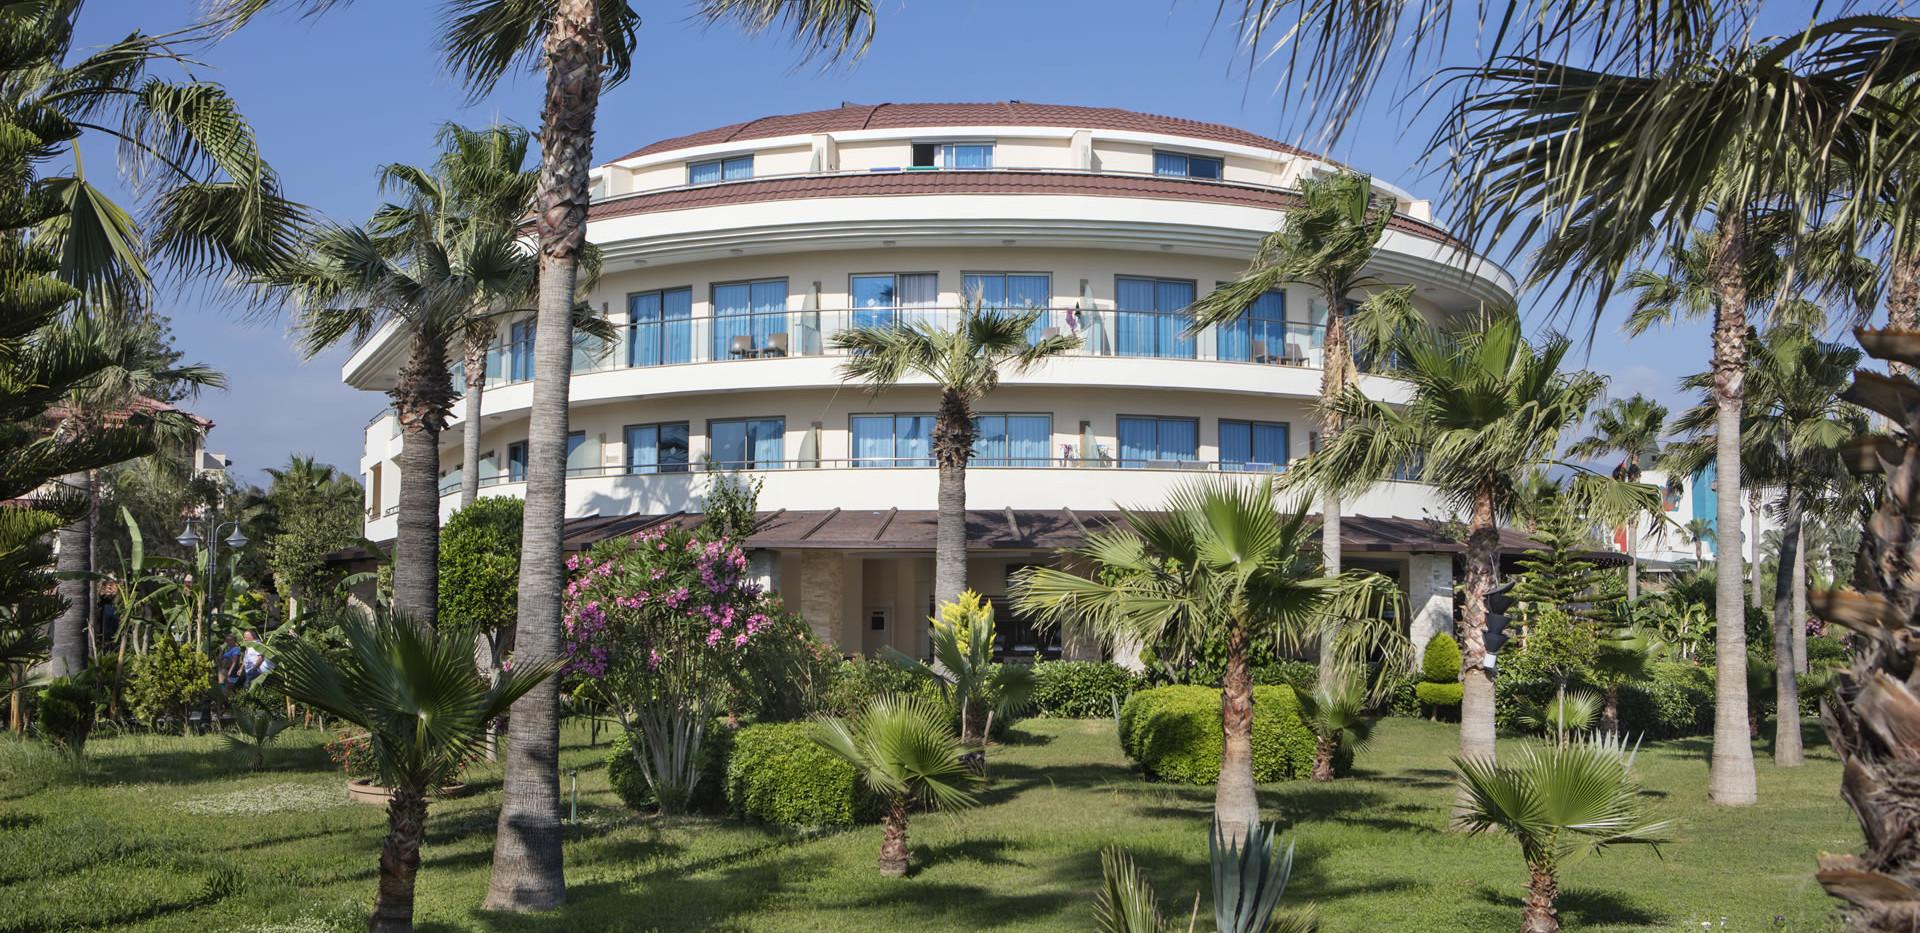 saphir-hotel-villas-otelimiz-027.jpg